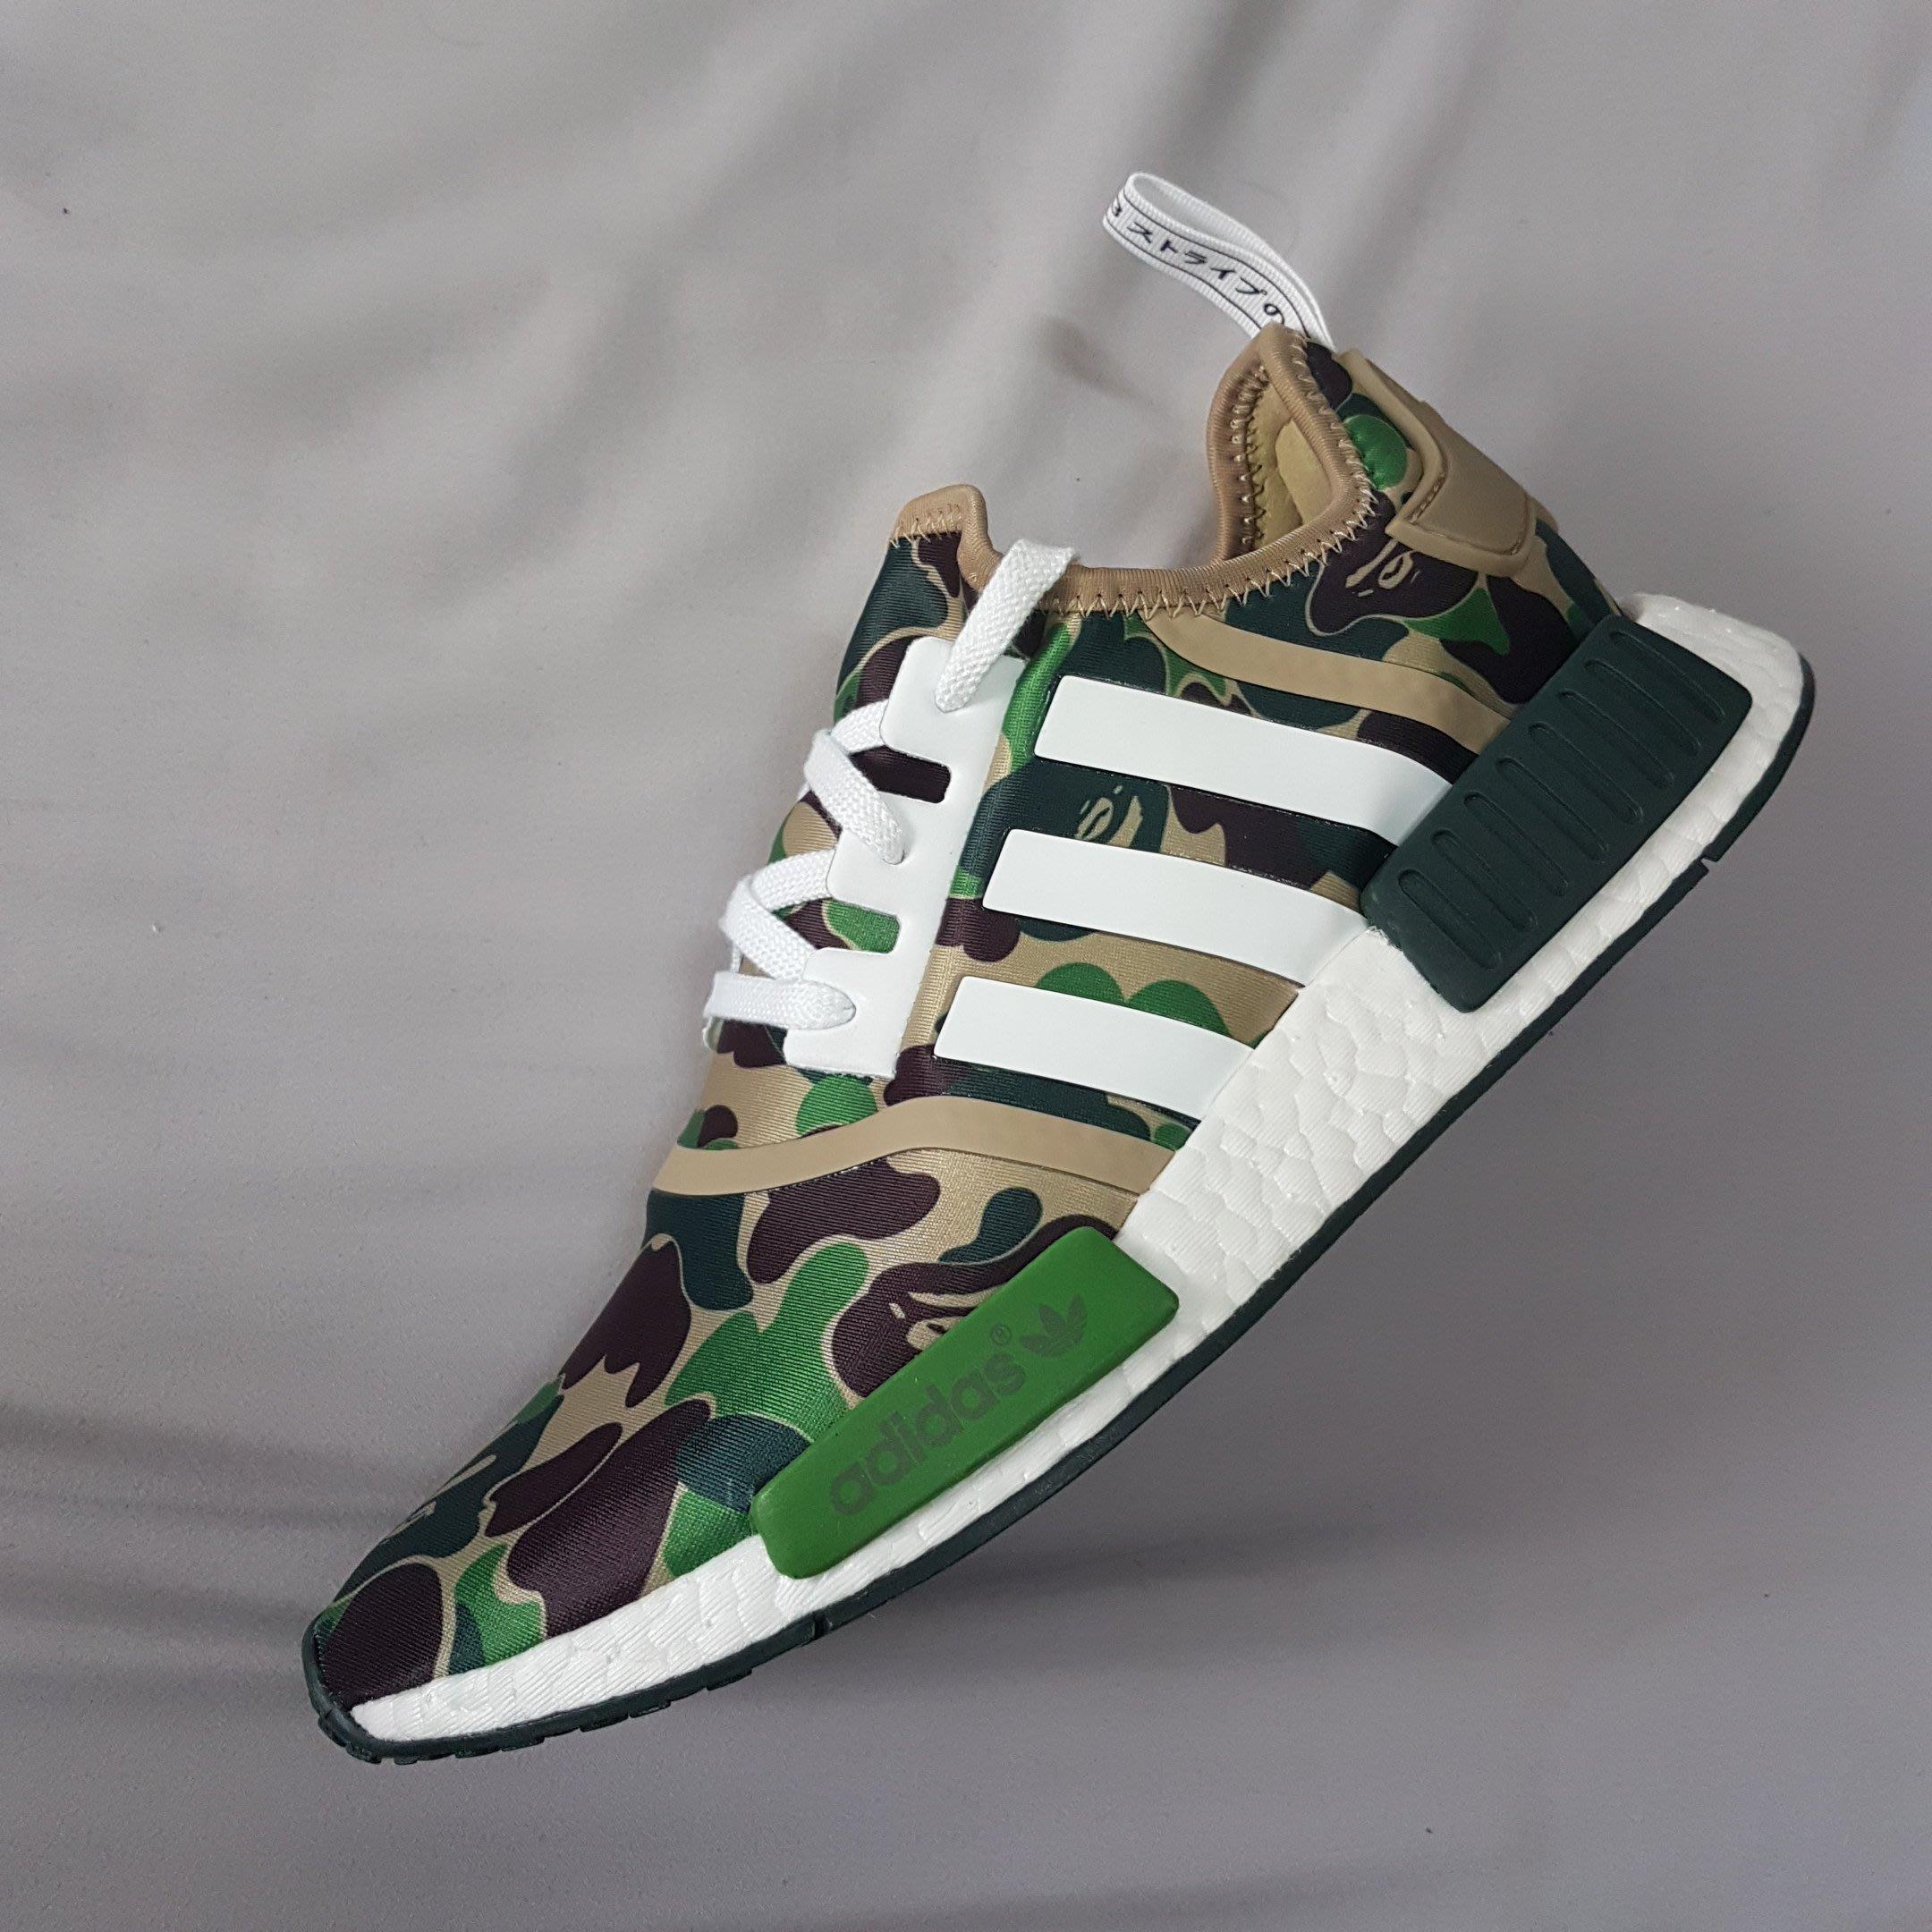 f646e59c84cc4 adidas Originals NMD R1 BAPE APE NMD 猿人神鞋綠迷彩超限量釋出